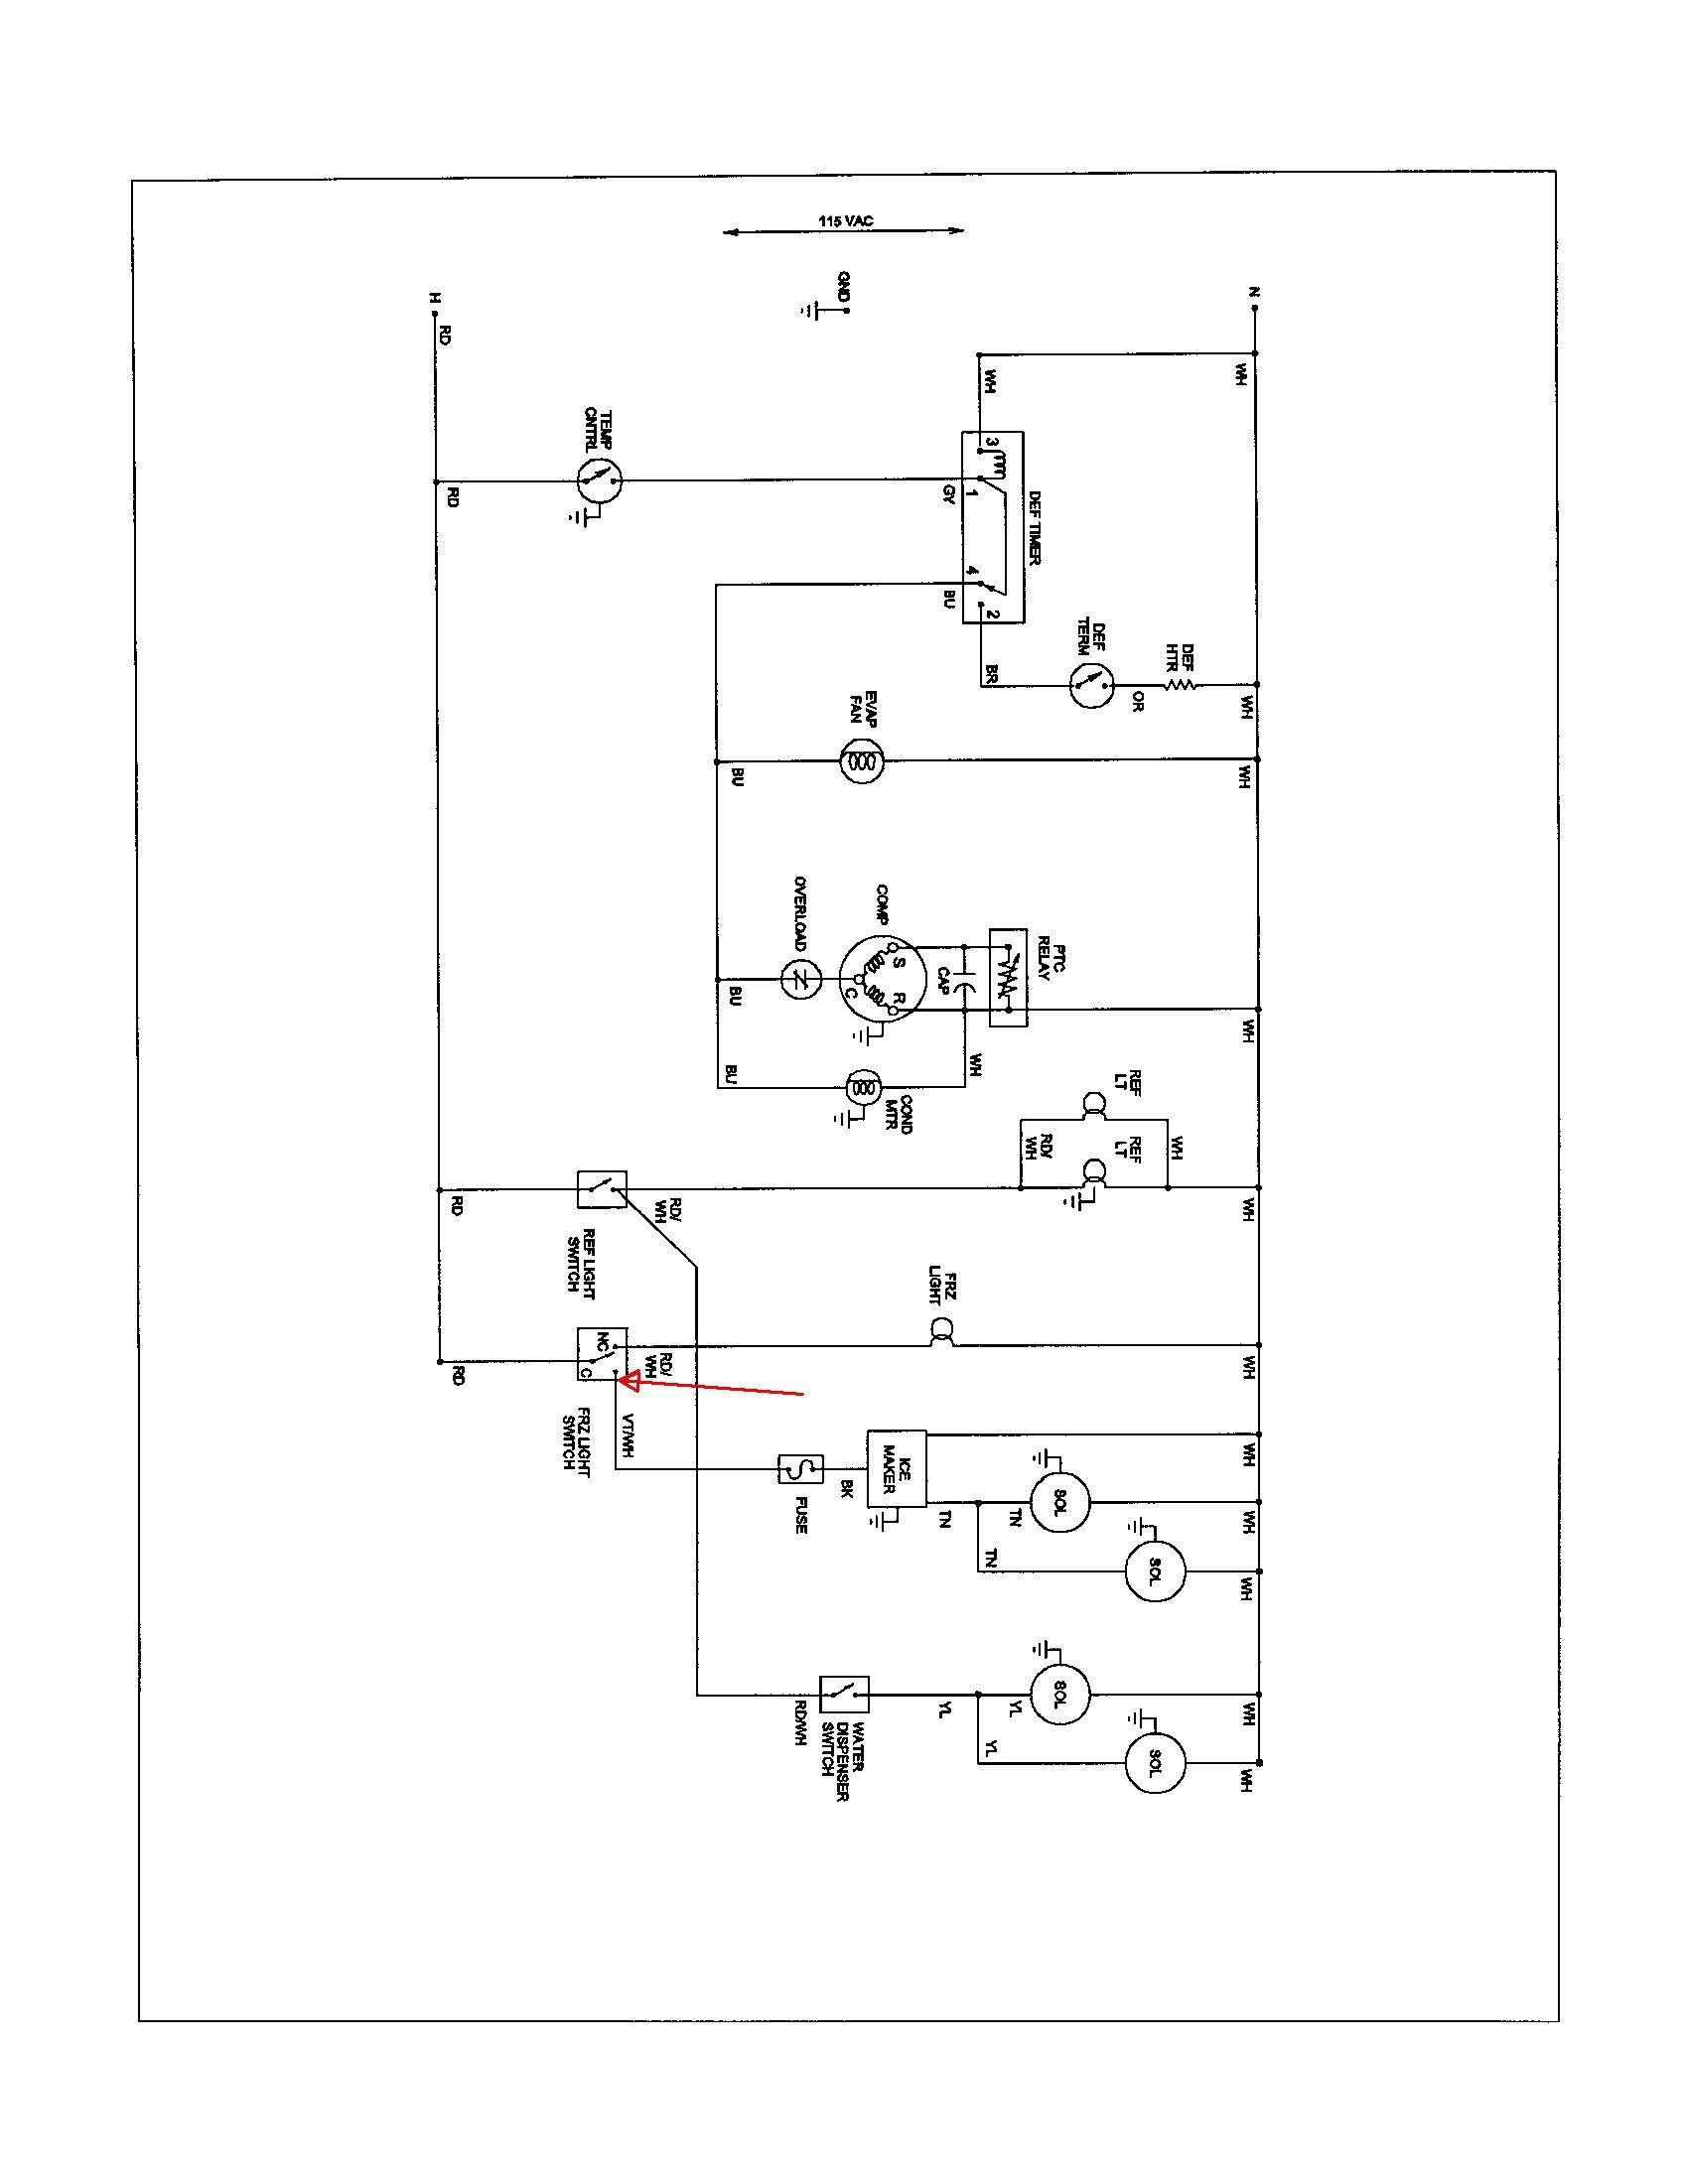 Wiring Diagram Of Freezer | Wiring Library - True Freezer T 49F Wiring Diagram